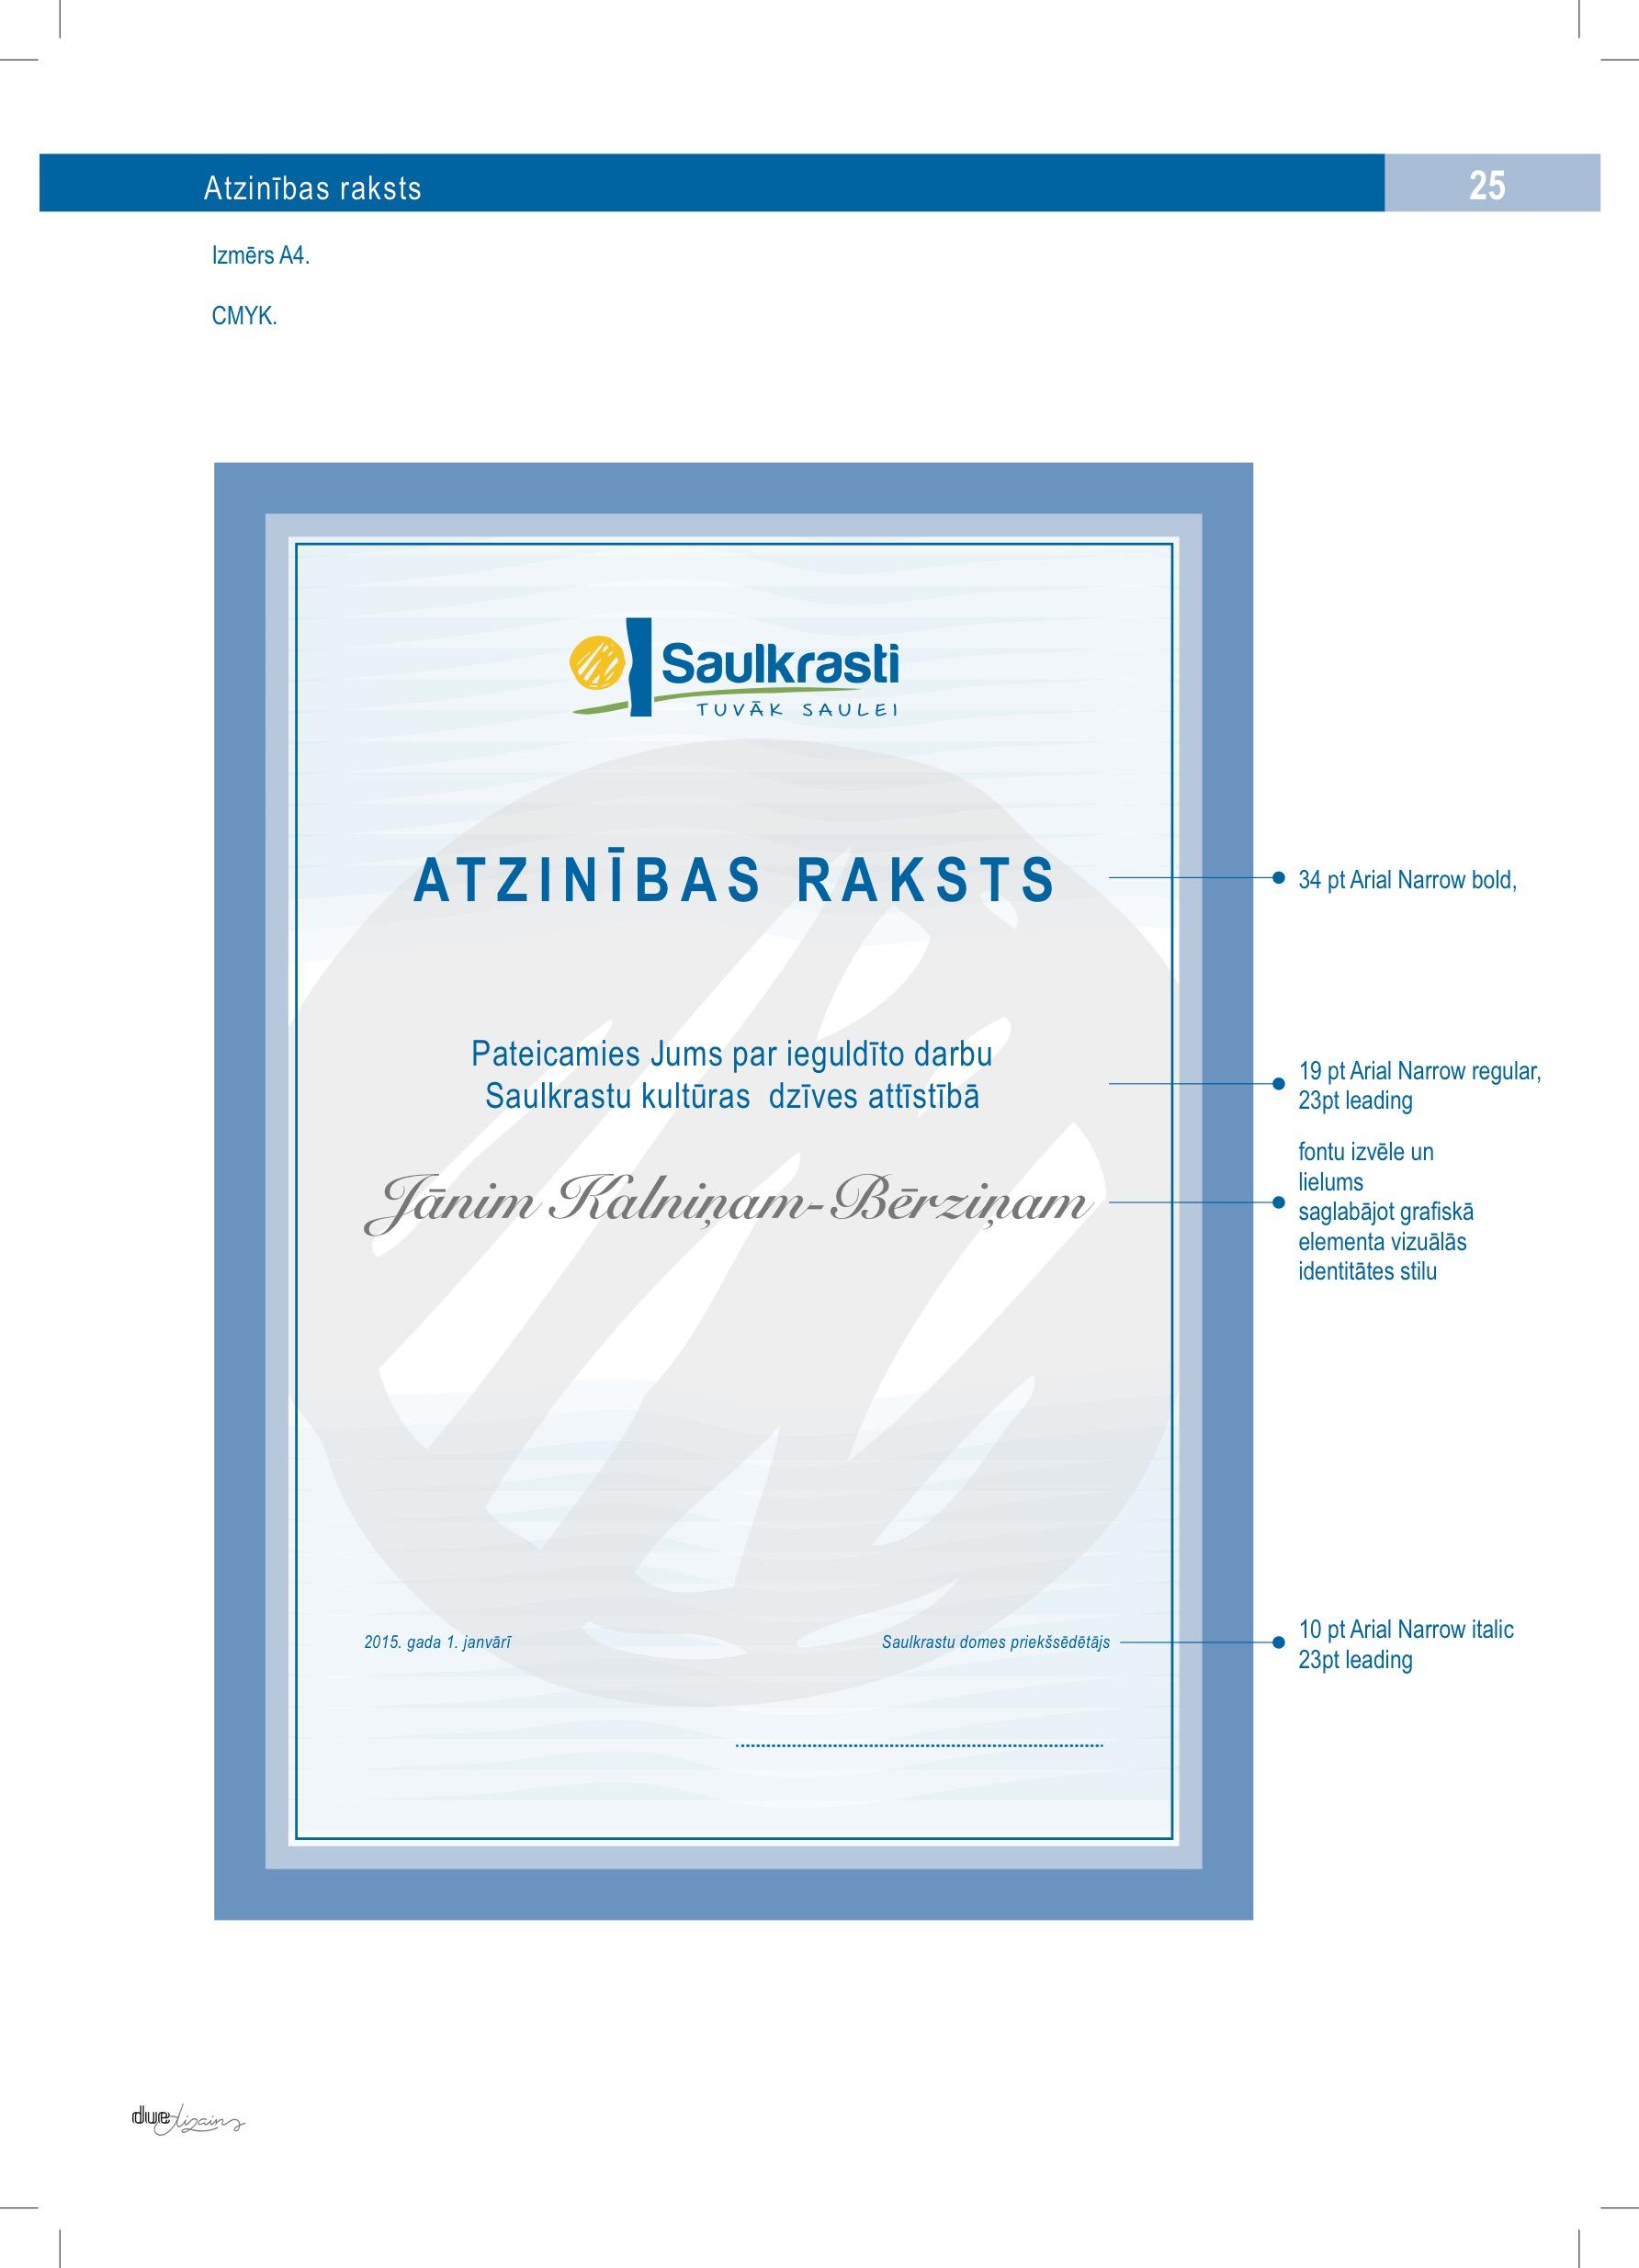 saulkrasti-print 27